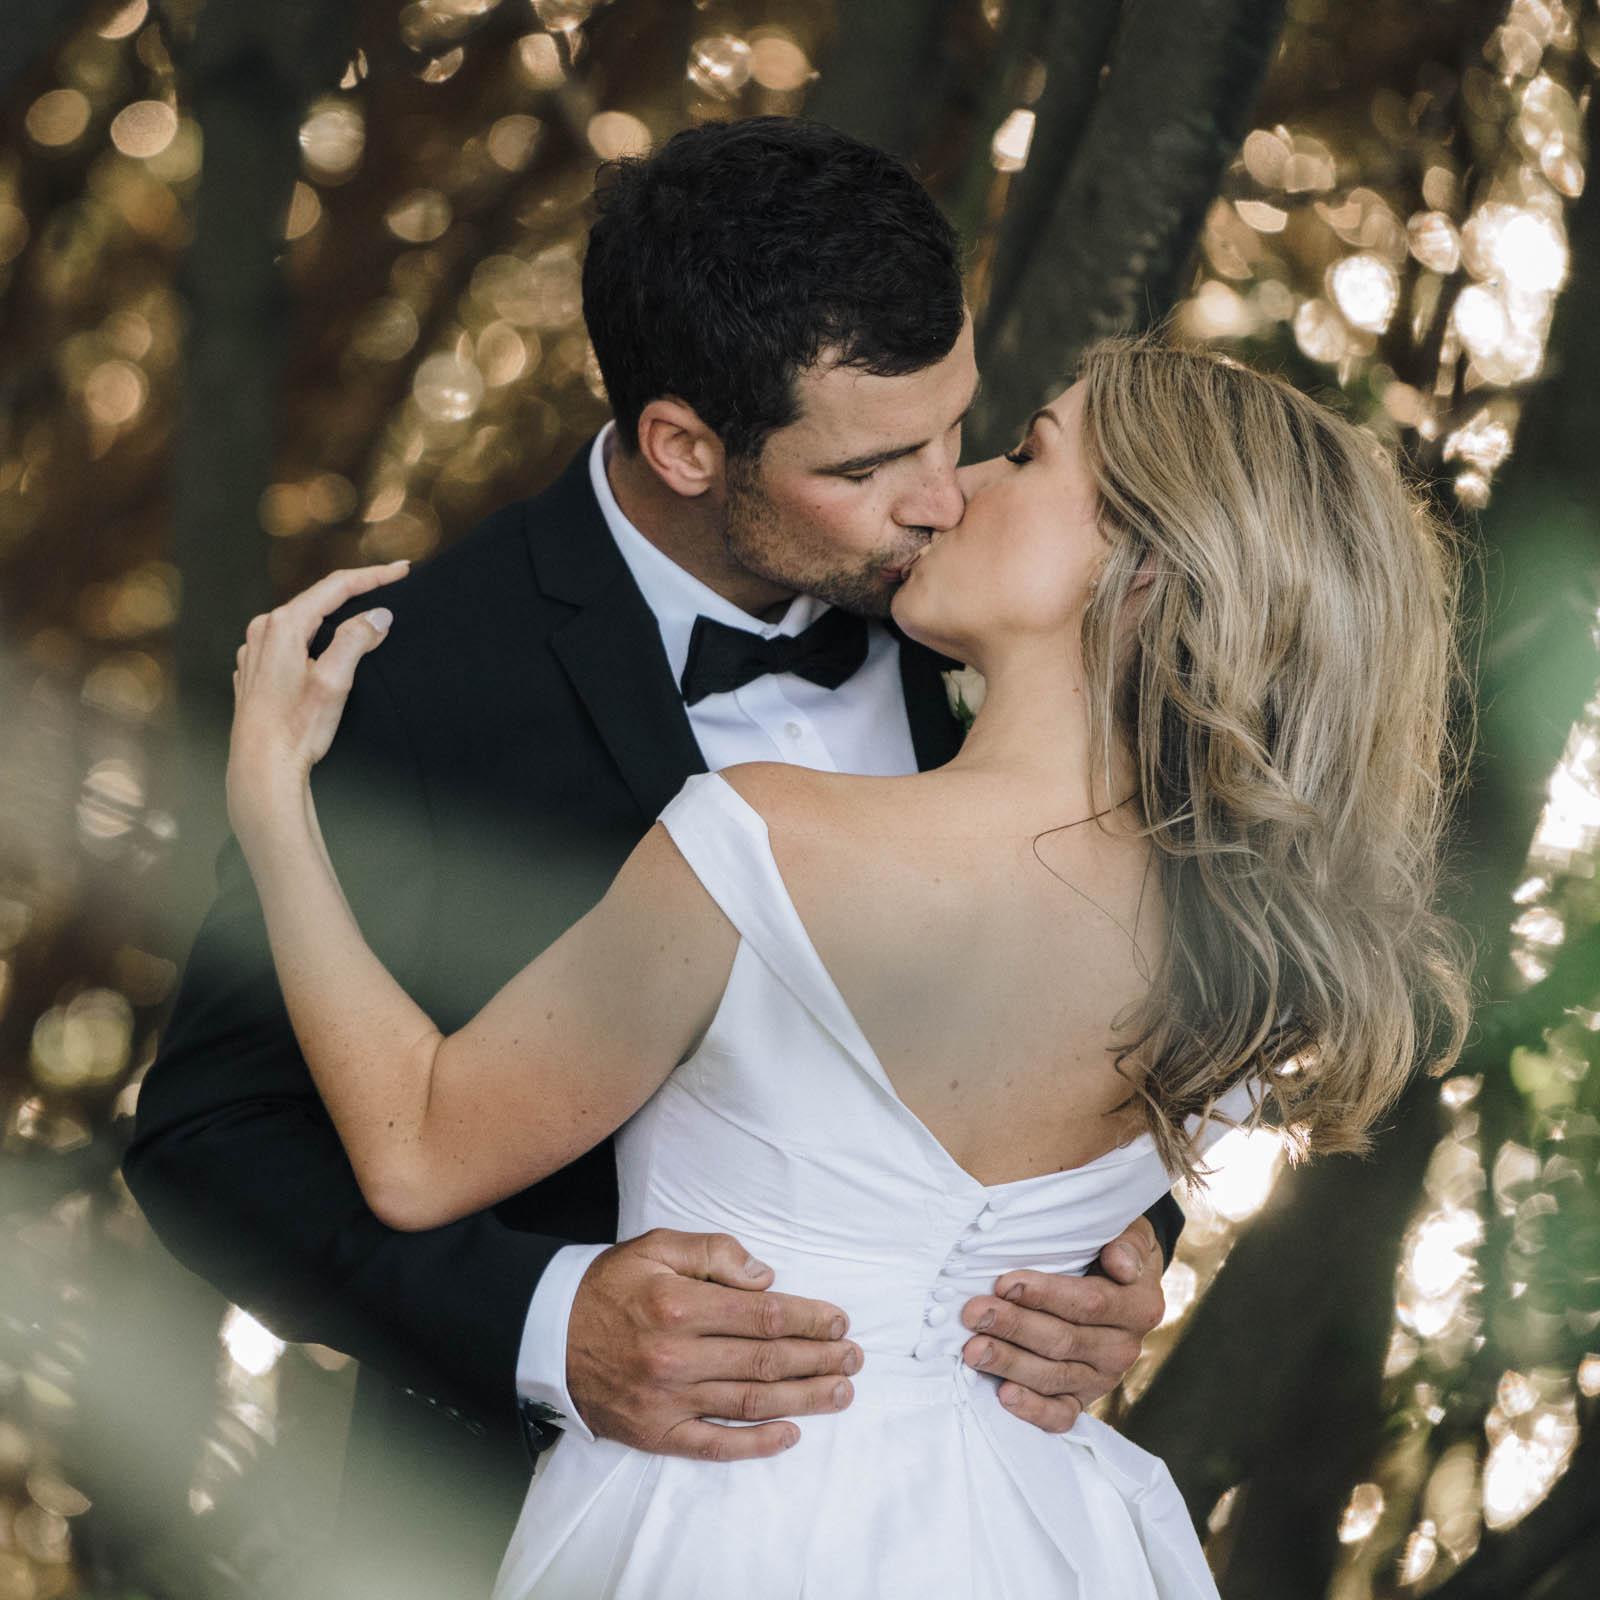 newfound-s-p-mt-maunganui-tauranga-wedding-photographer-1602-LQ109853